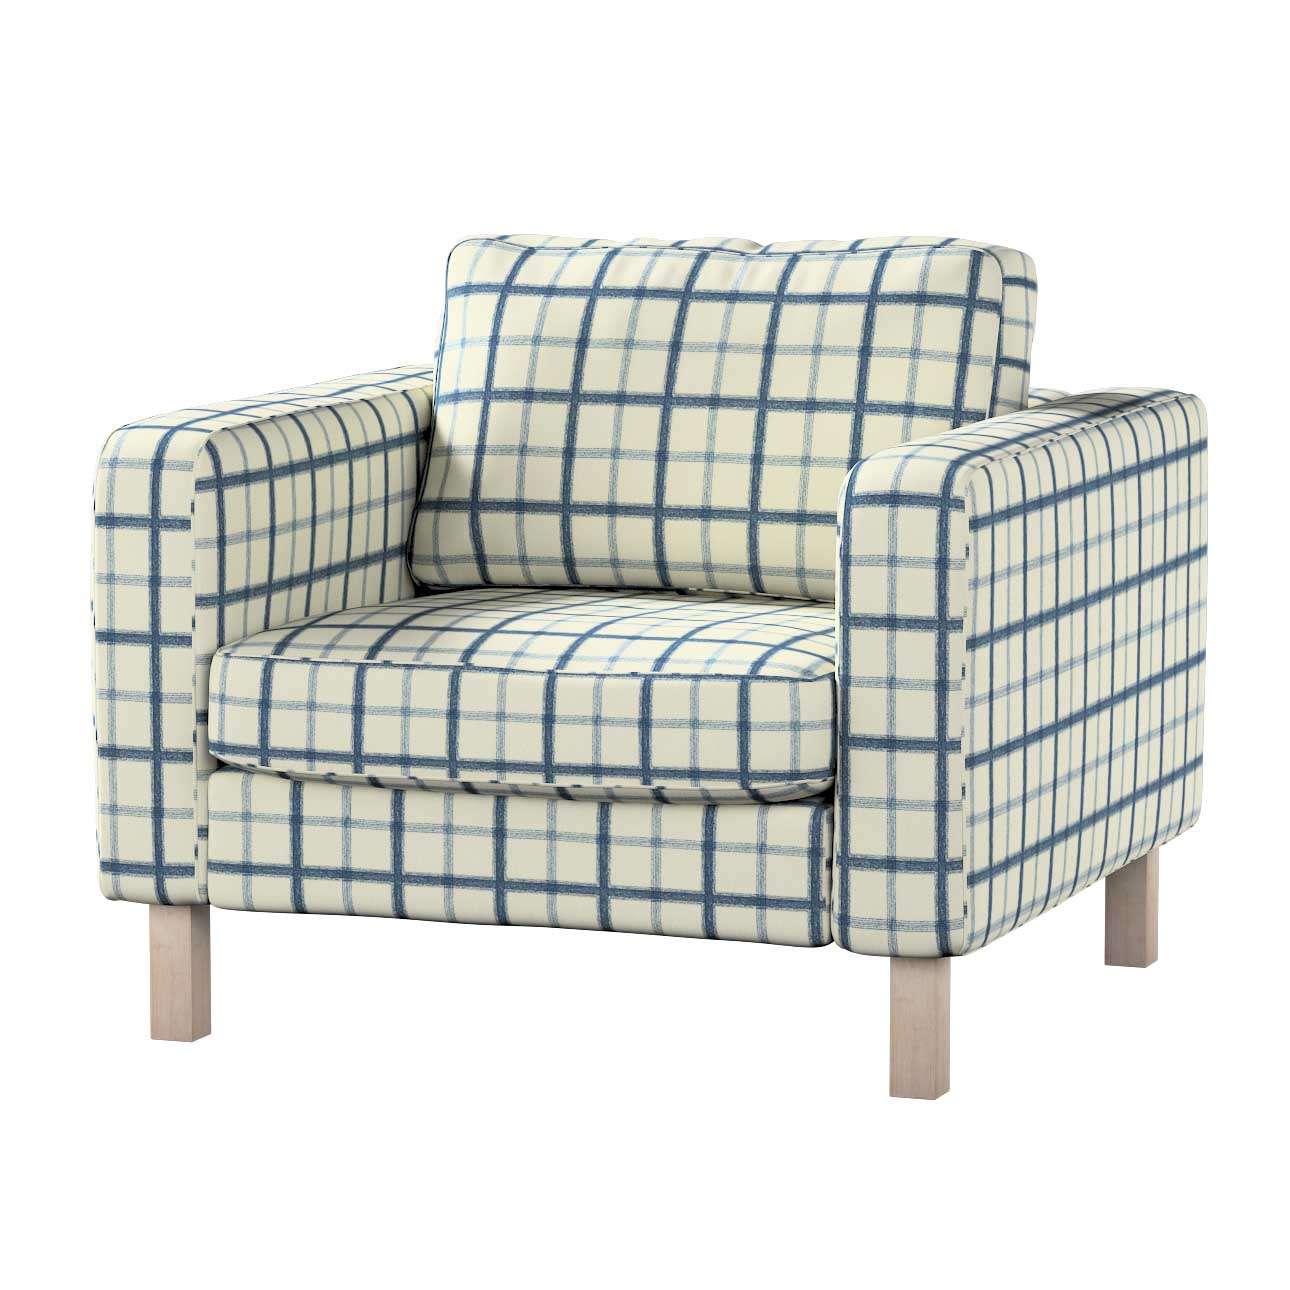 Pokrowiec na fotel Karlstad, krótki Fotel Karlstad w kolekcji Avinon, tkanina: 131-66